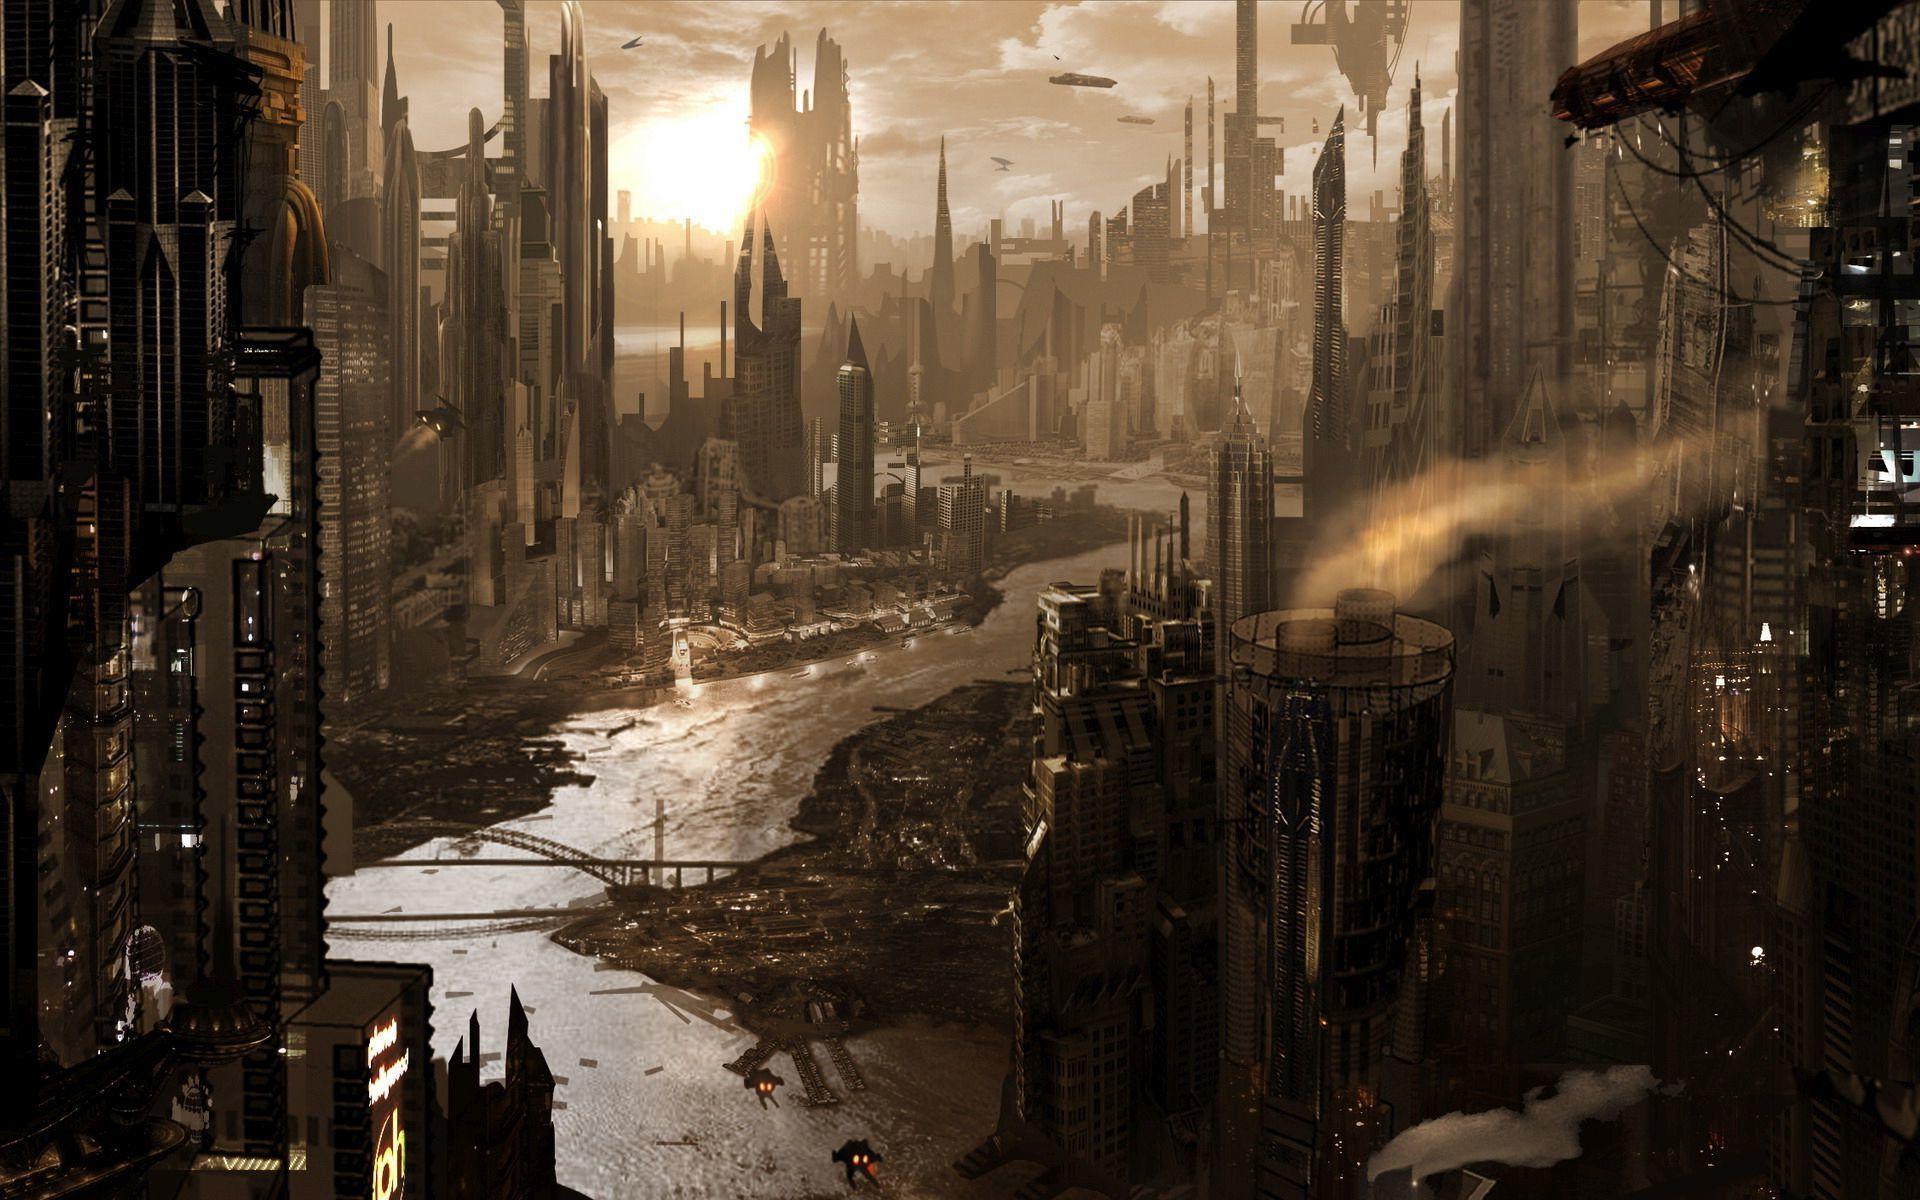 Steampunk City Wallpaper Google Search Illyustracii S Gorodom Gorodskoe Iskusstvo